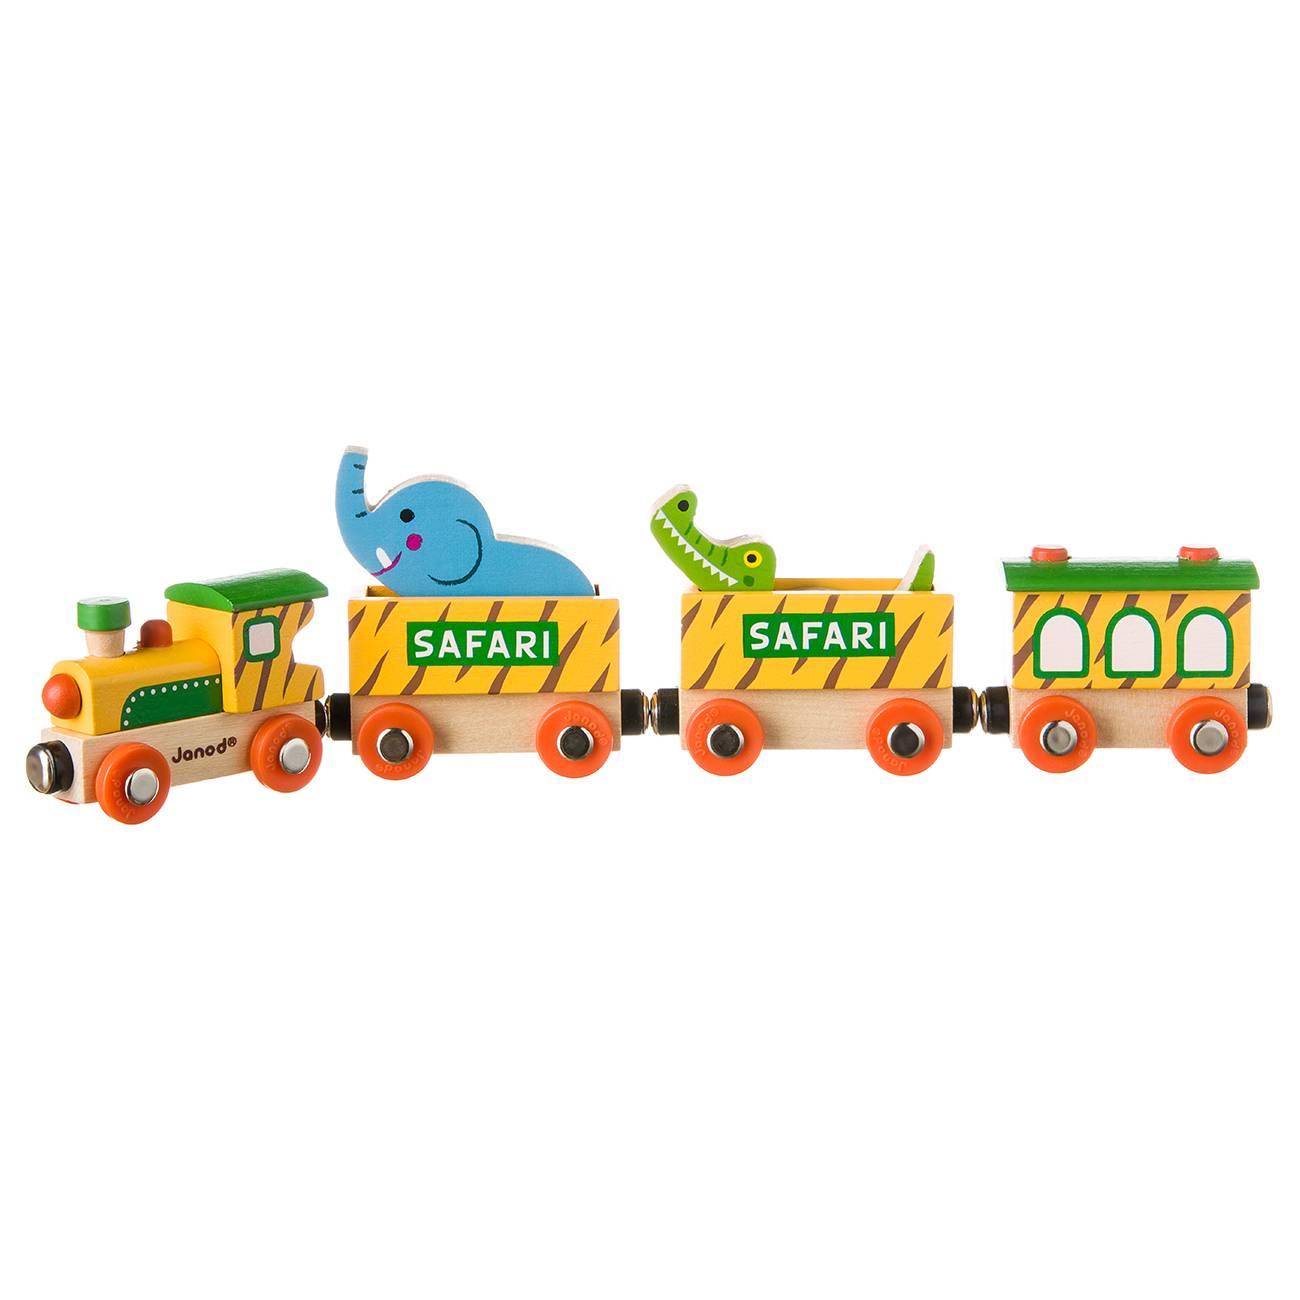 STORY-SAFARI TRAIN